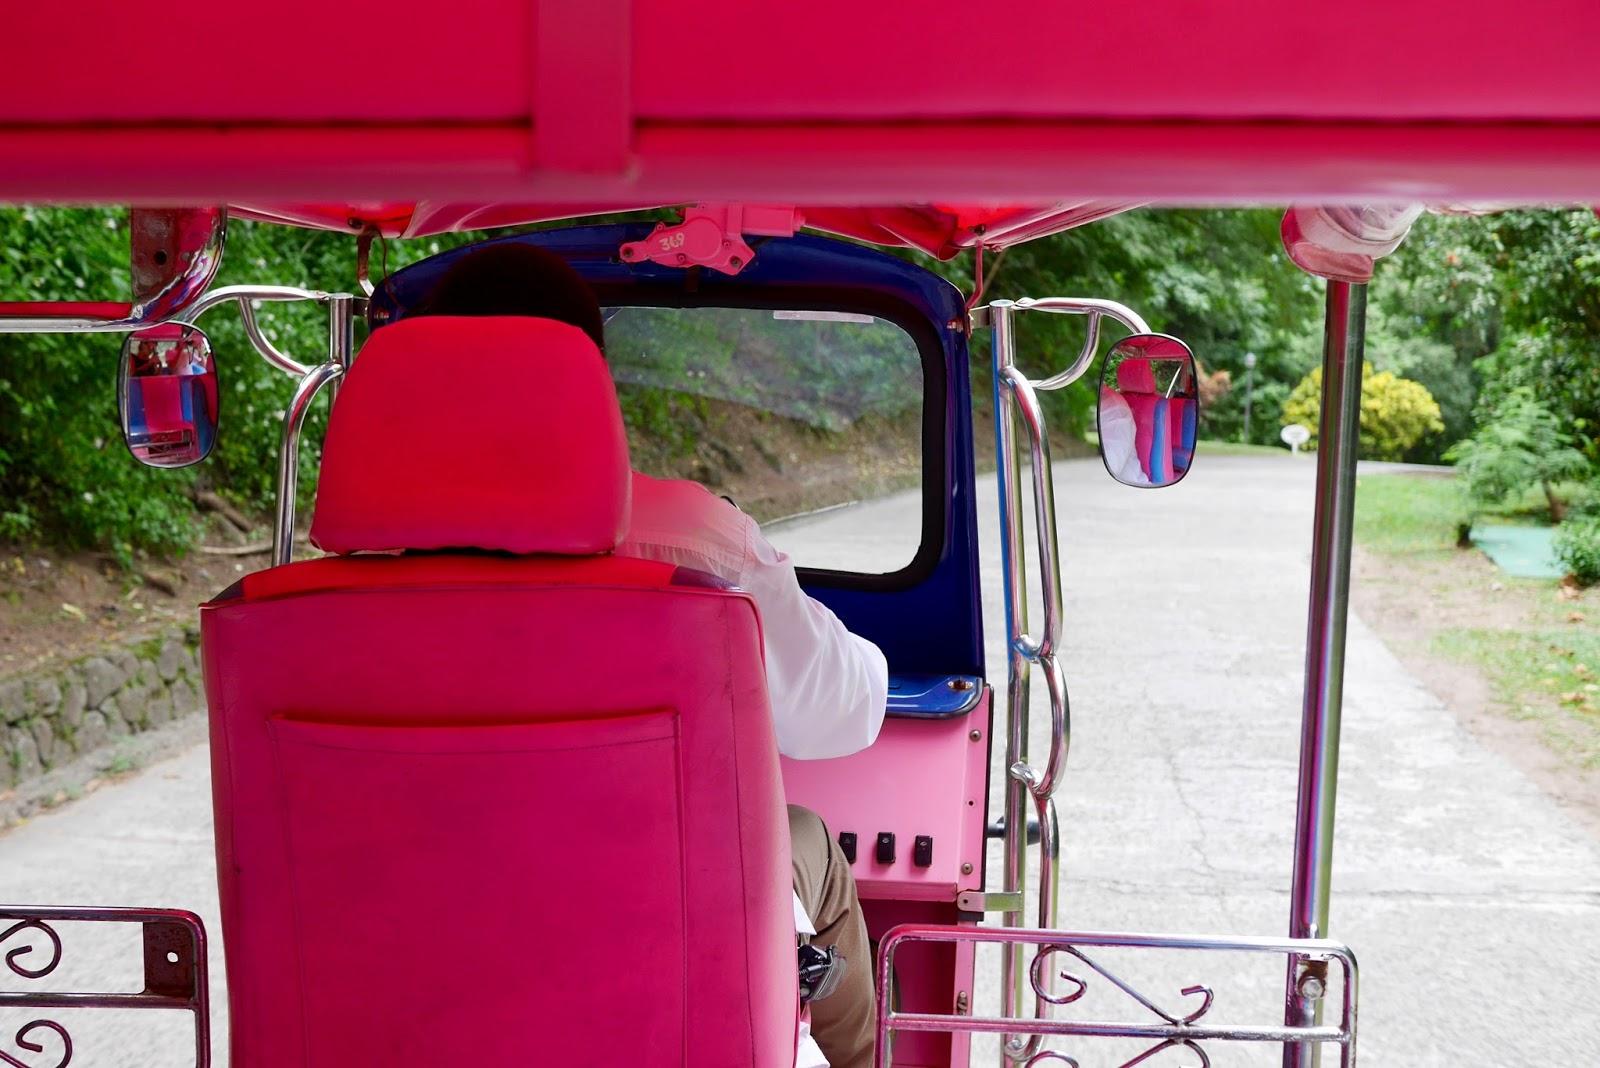 Pink golf cart, sugar beach, Soufrière, St Lucia by www.CalMcTravels.com